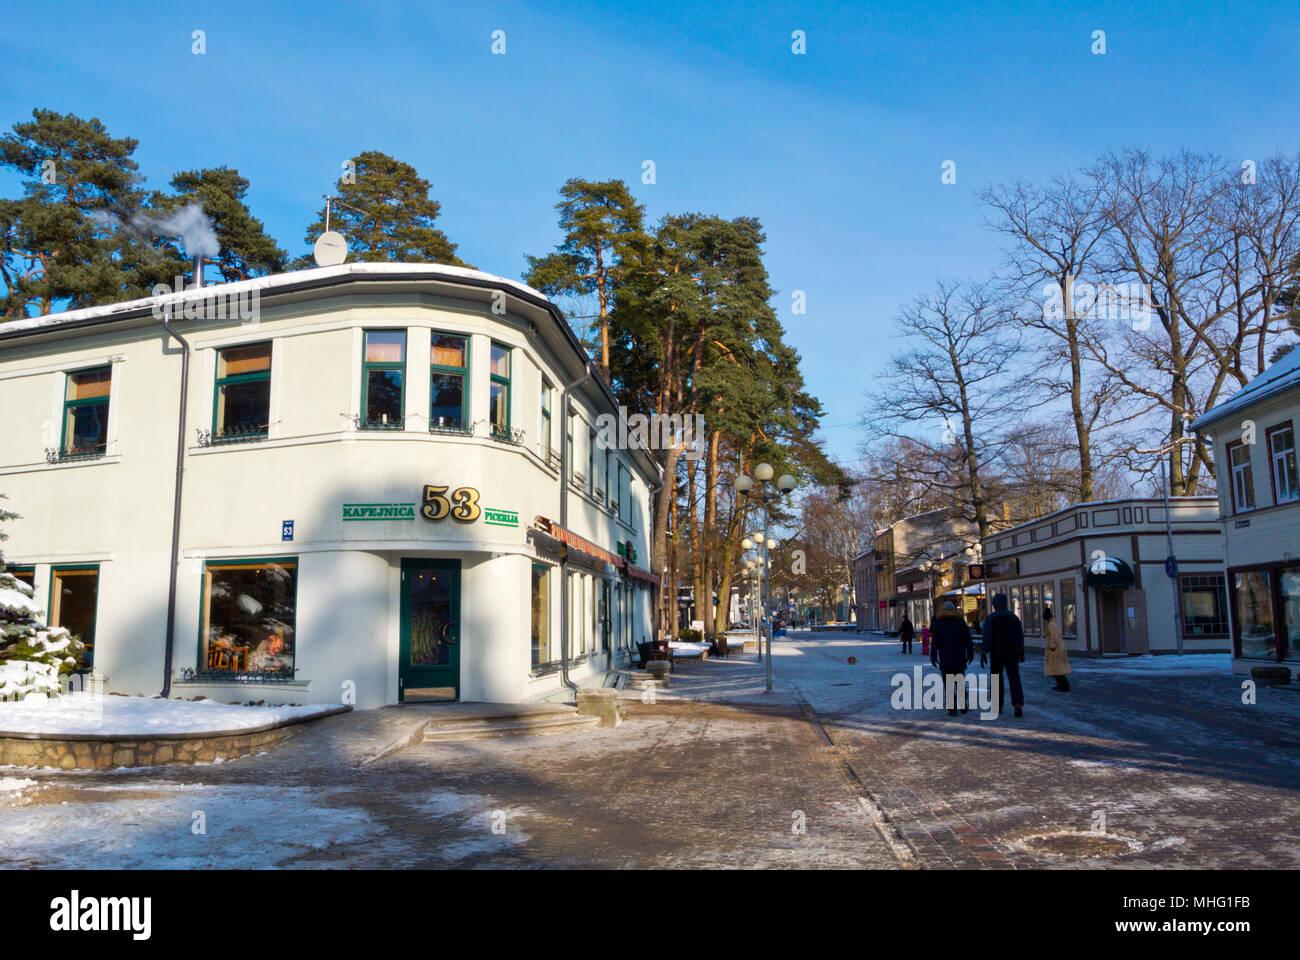 Jomas iela, Majori, Jurmala, Latvia - Stock Image